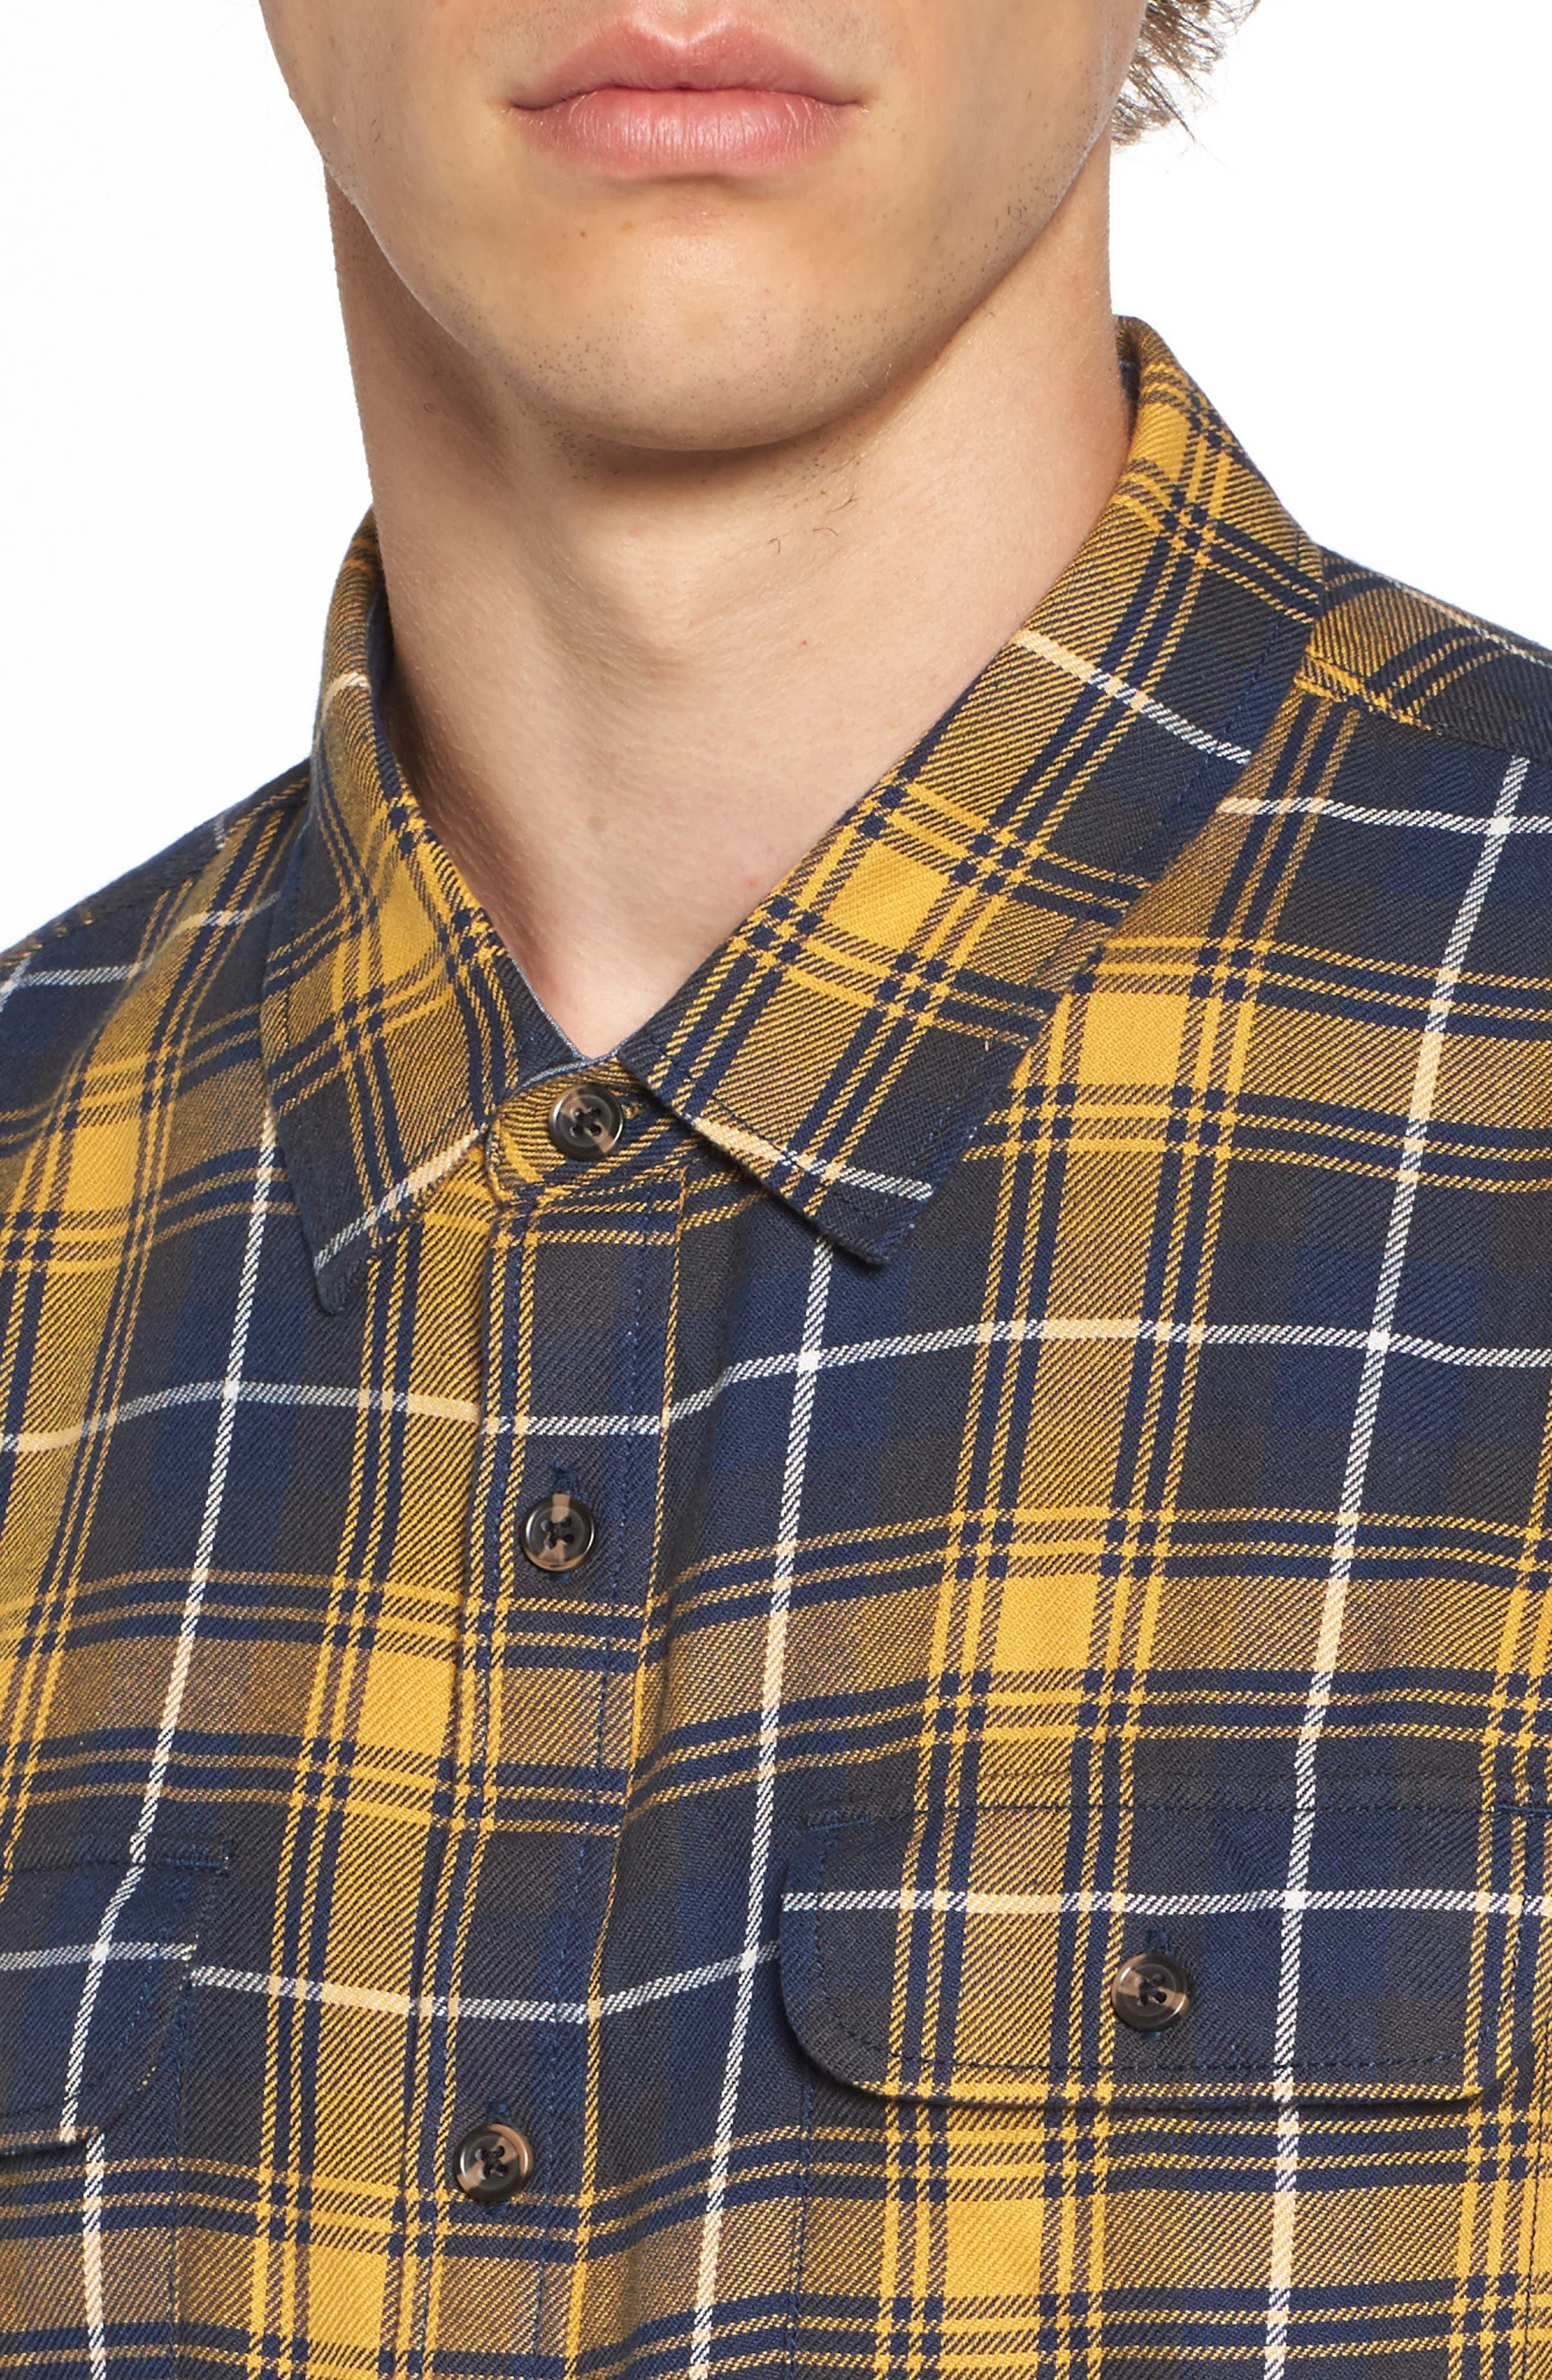 Sycamore Plaid Flannel Sport Shirt,                             Alternate thumbnail 4, color,                             720